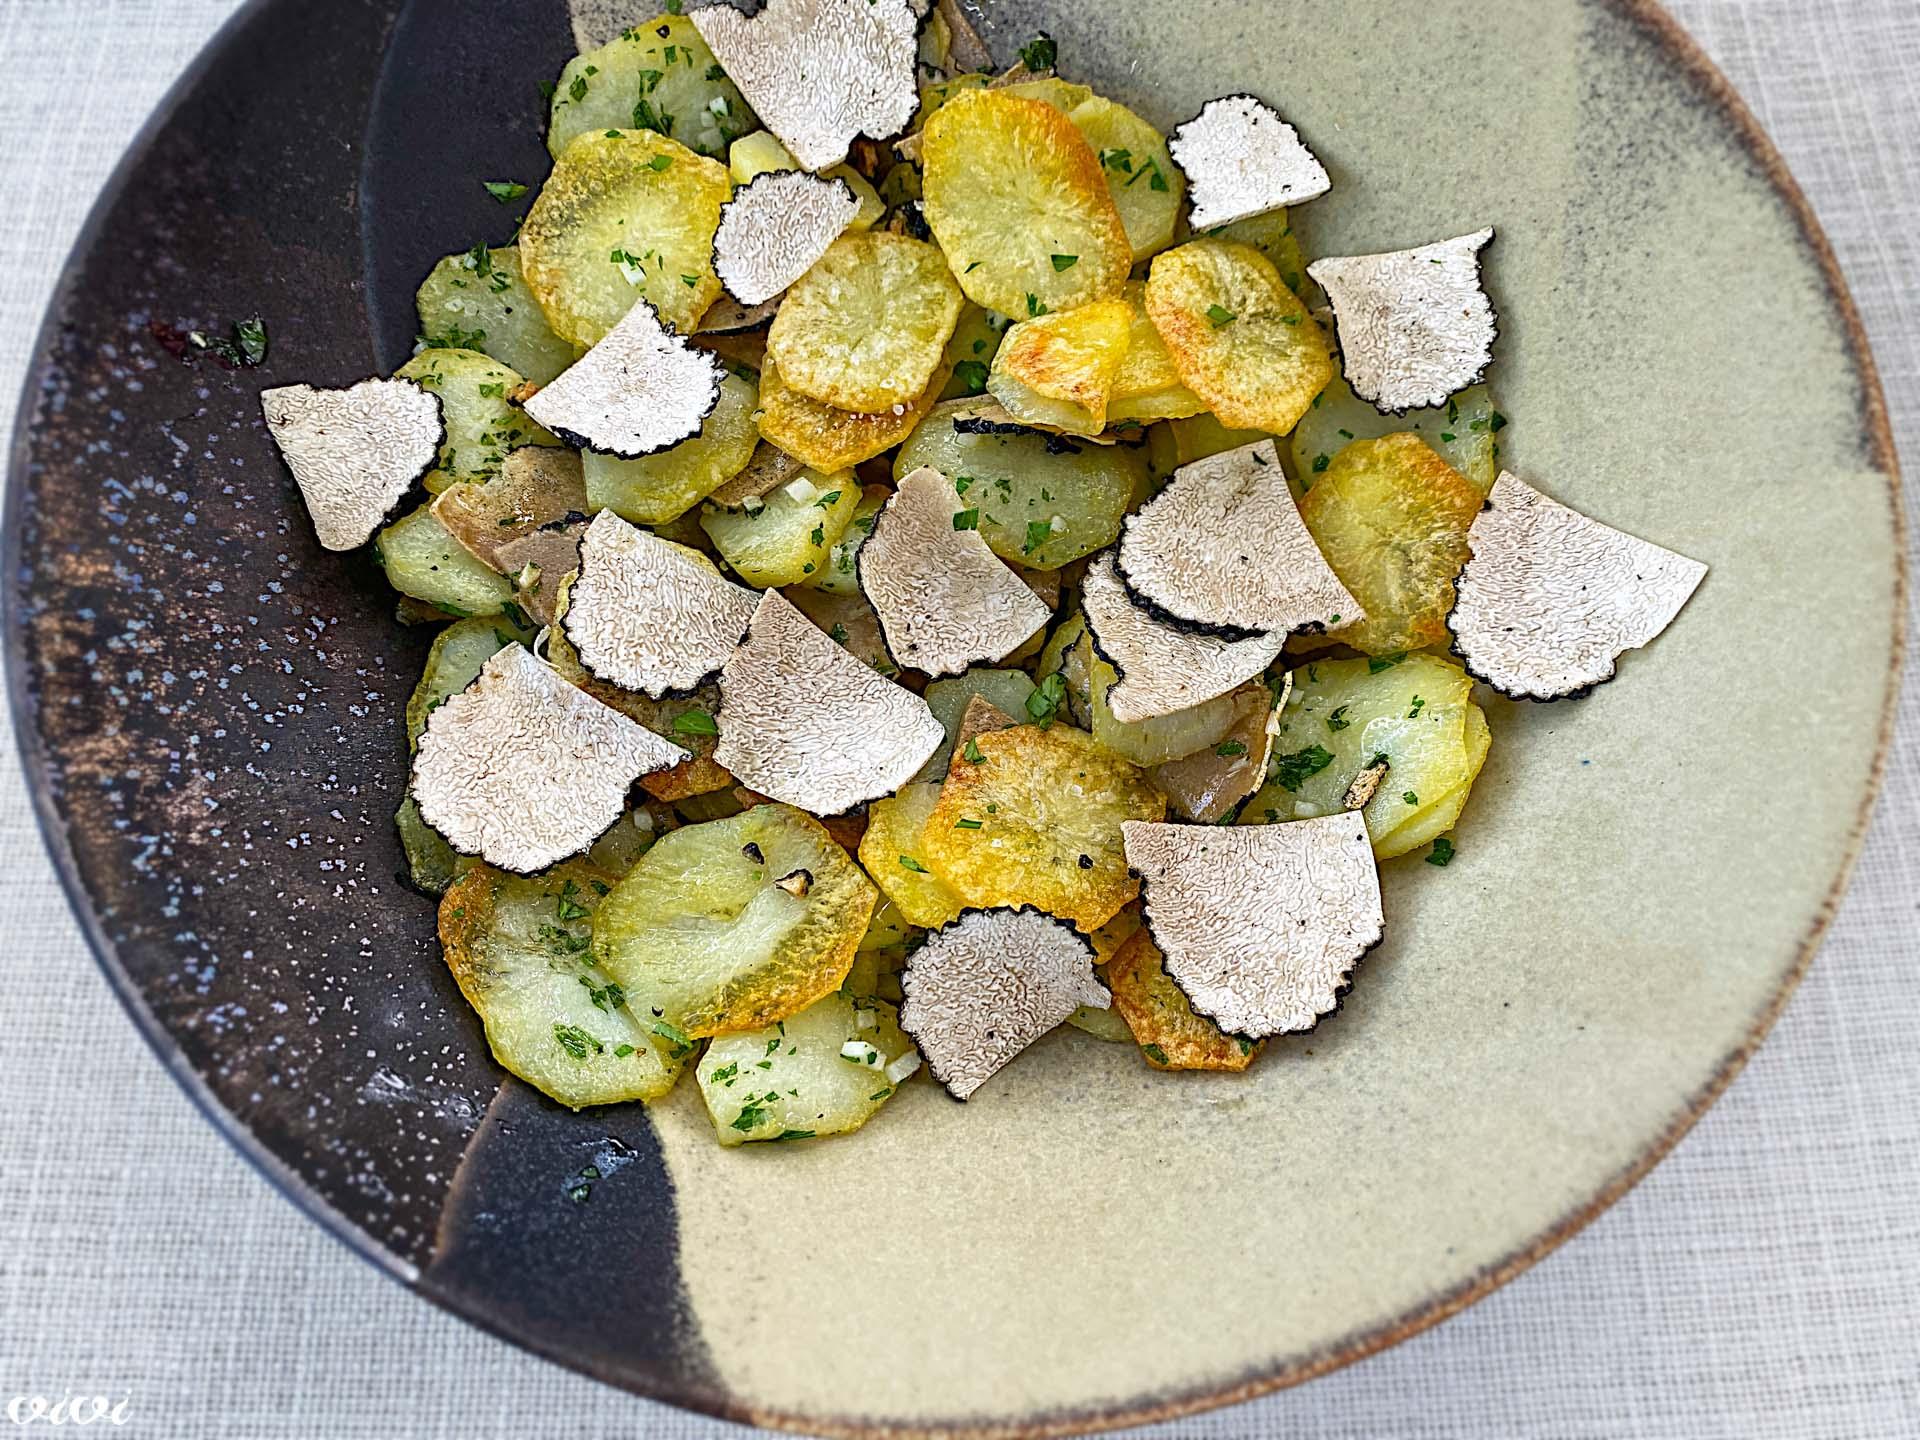 krompir sarladaises s tartufi2